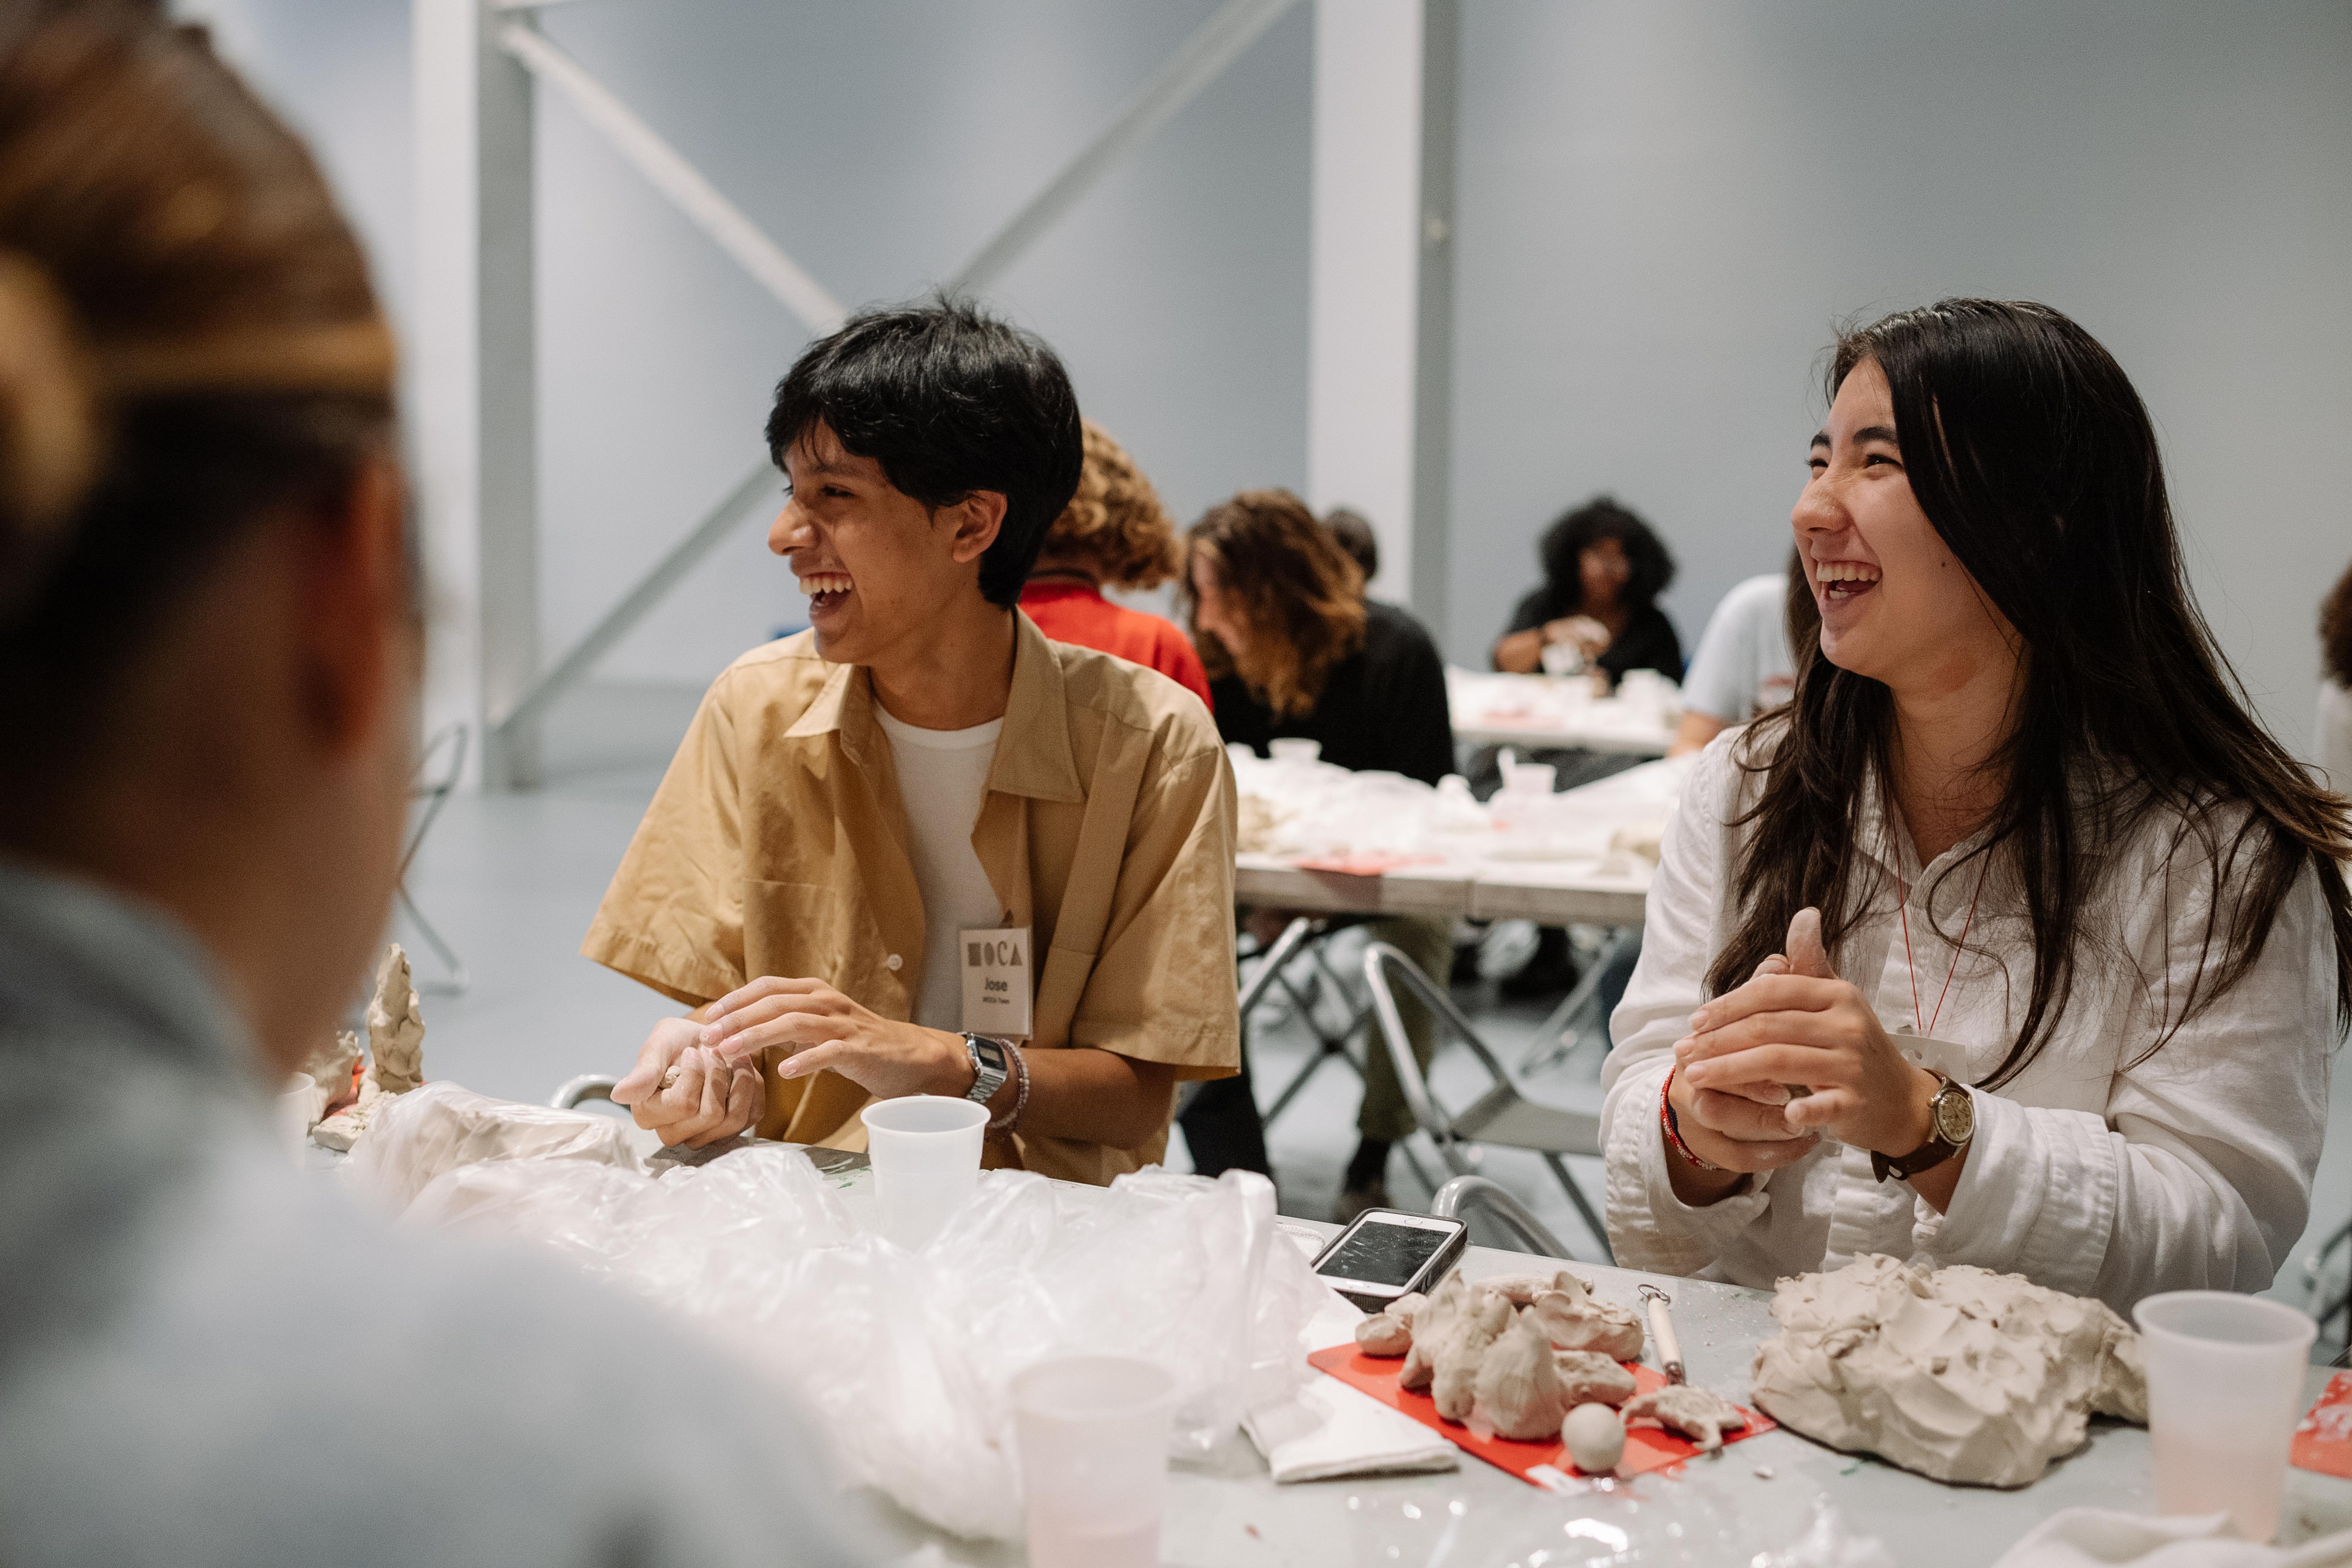 MOCA Teen Workshop. Photo by Nico Therin, 2018.